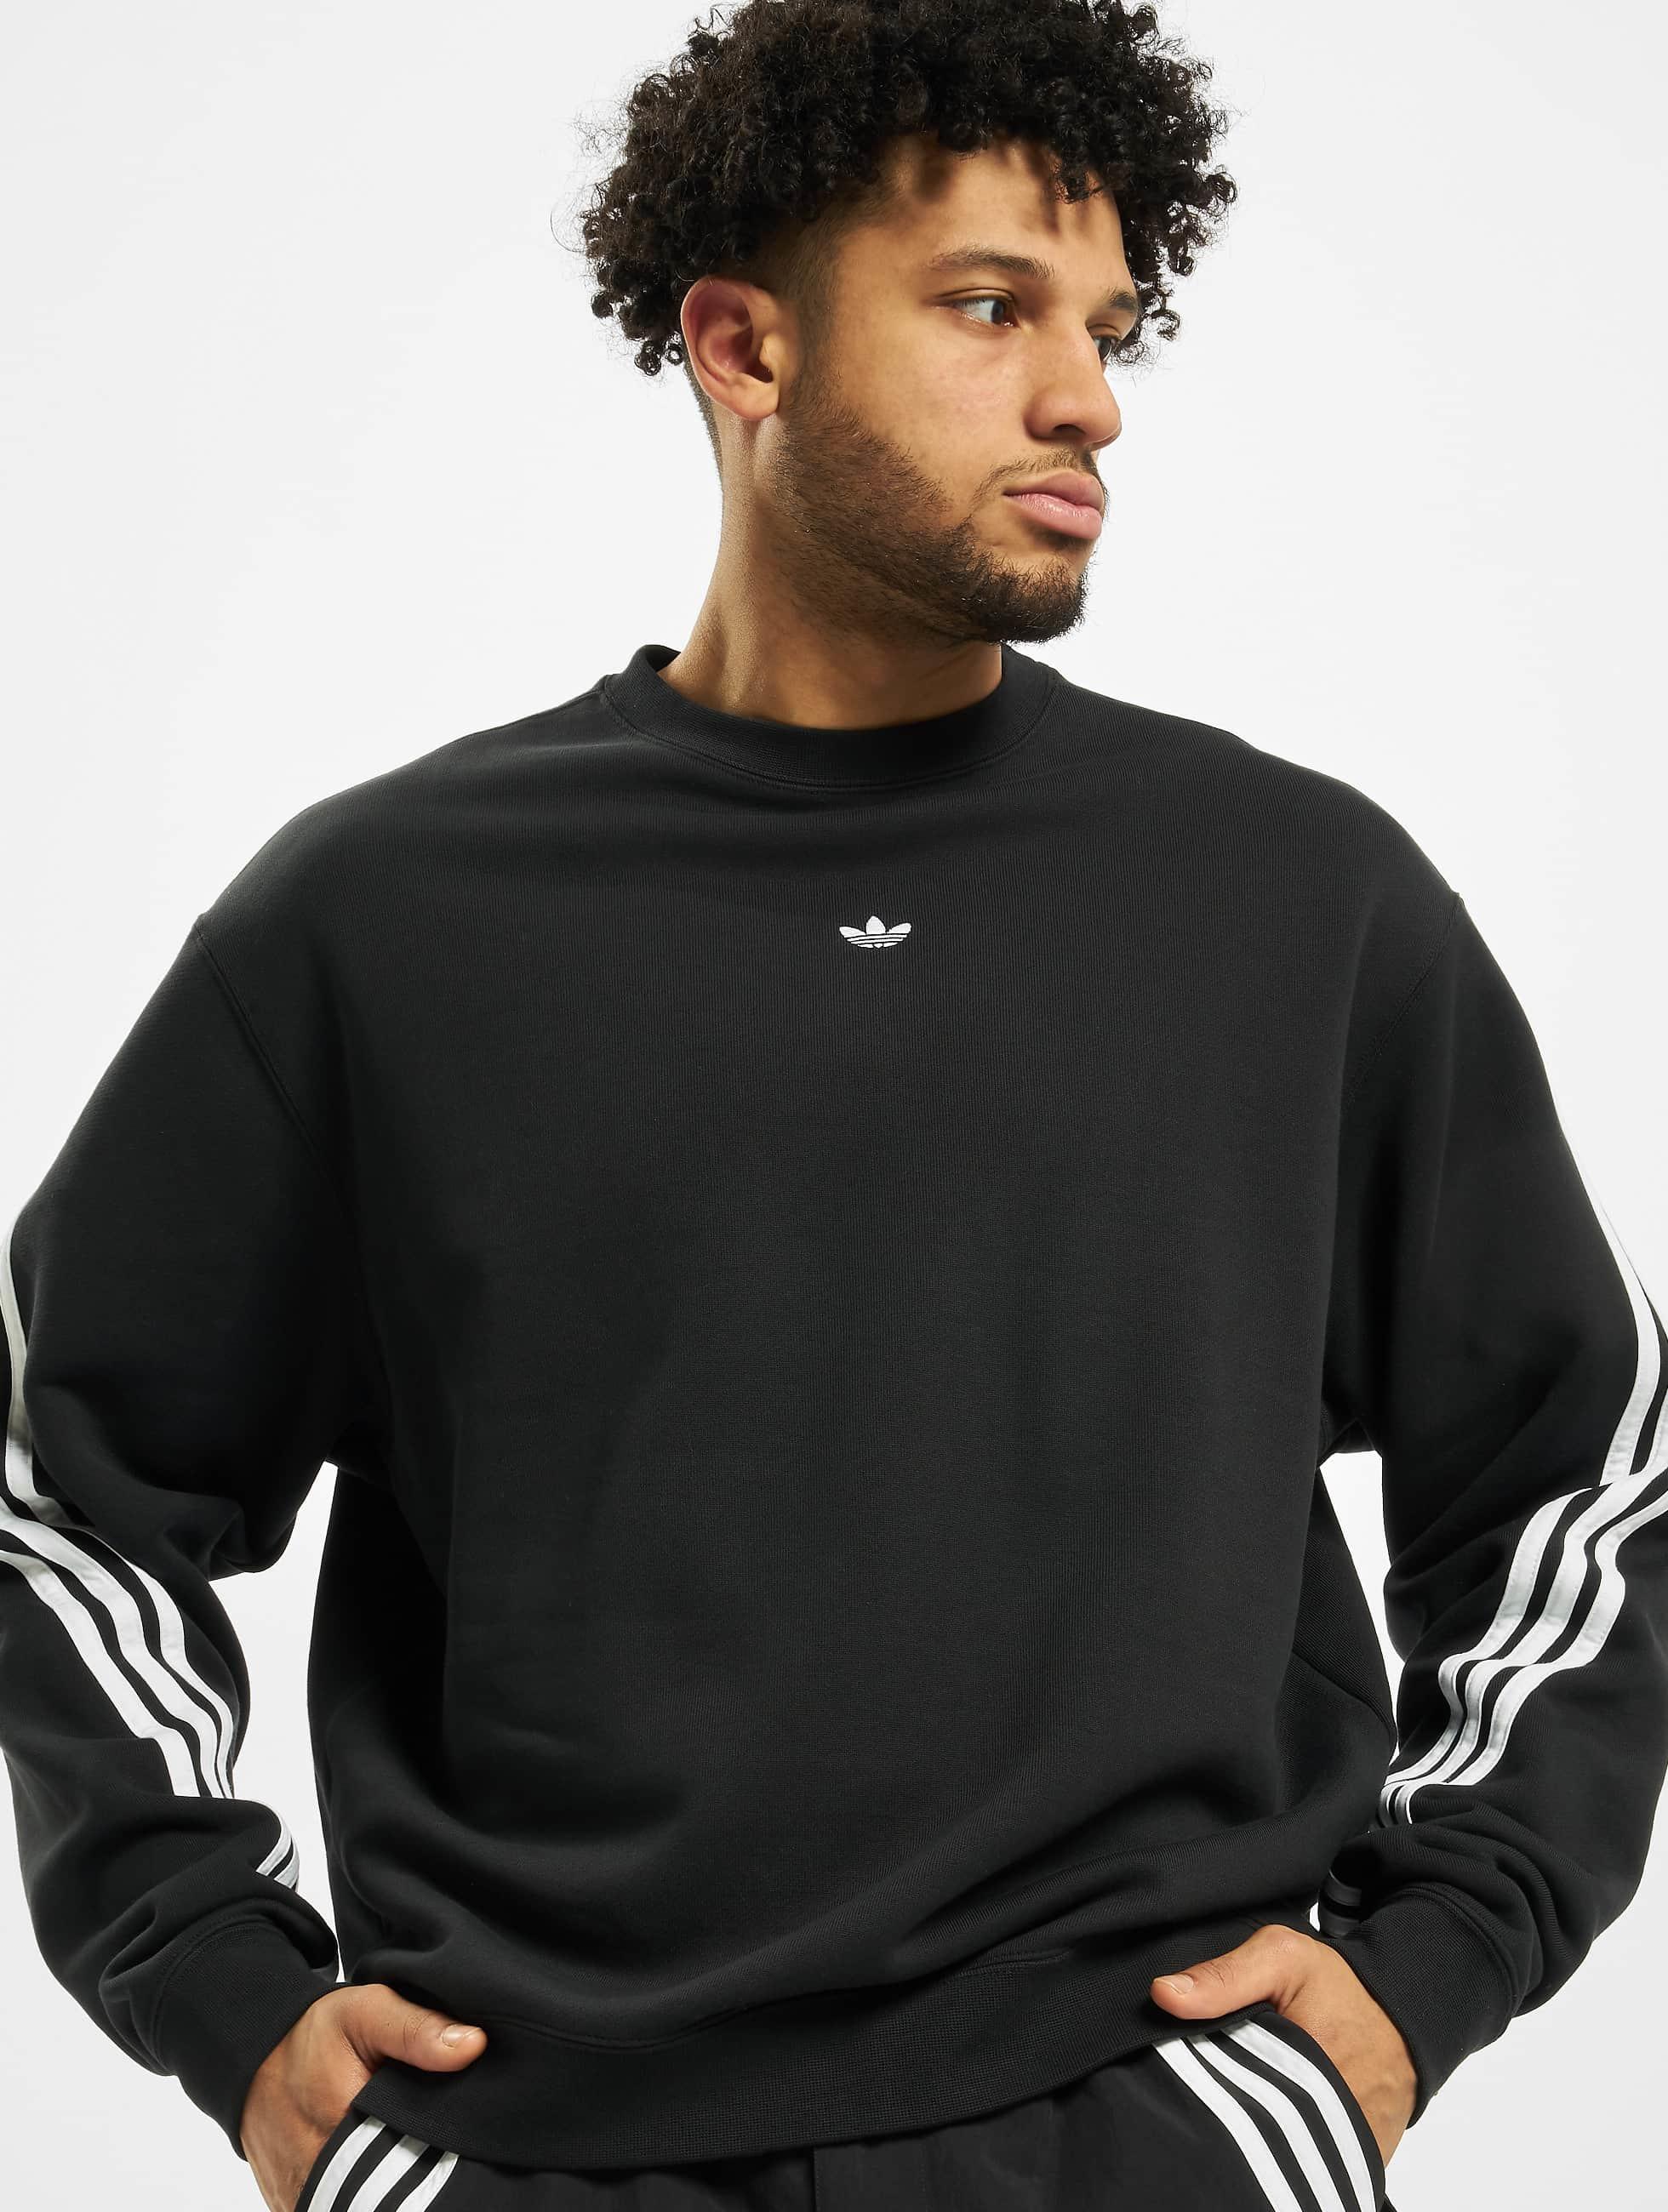 Adidas 3 Stripe Wrap Sweatshirt BlackWhite